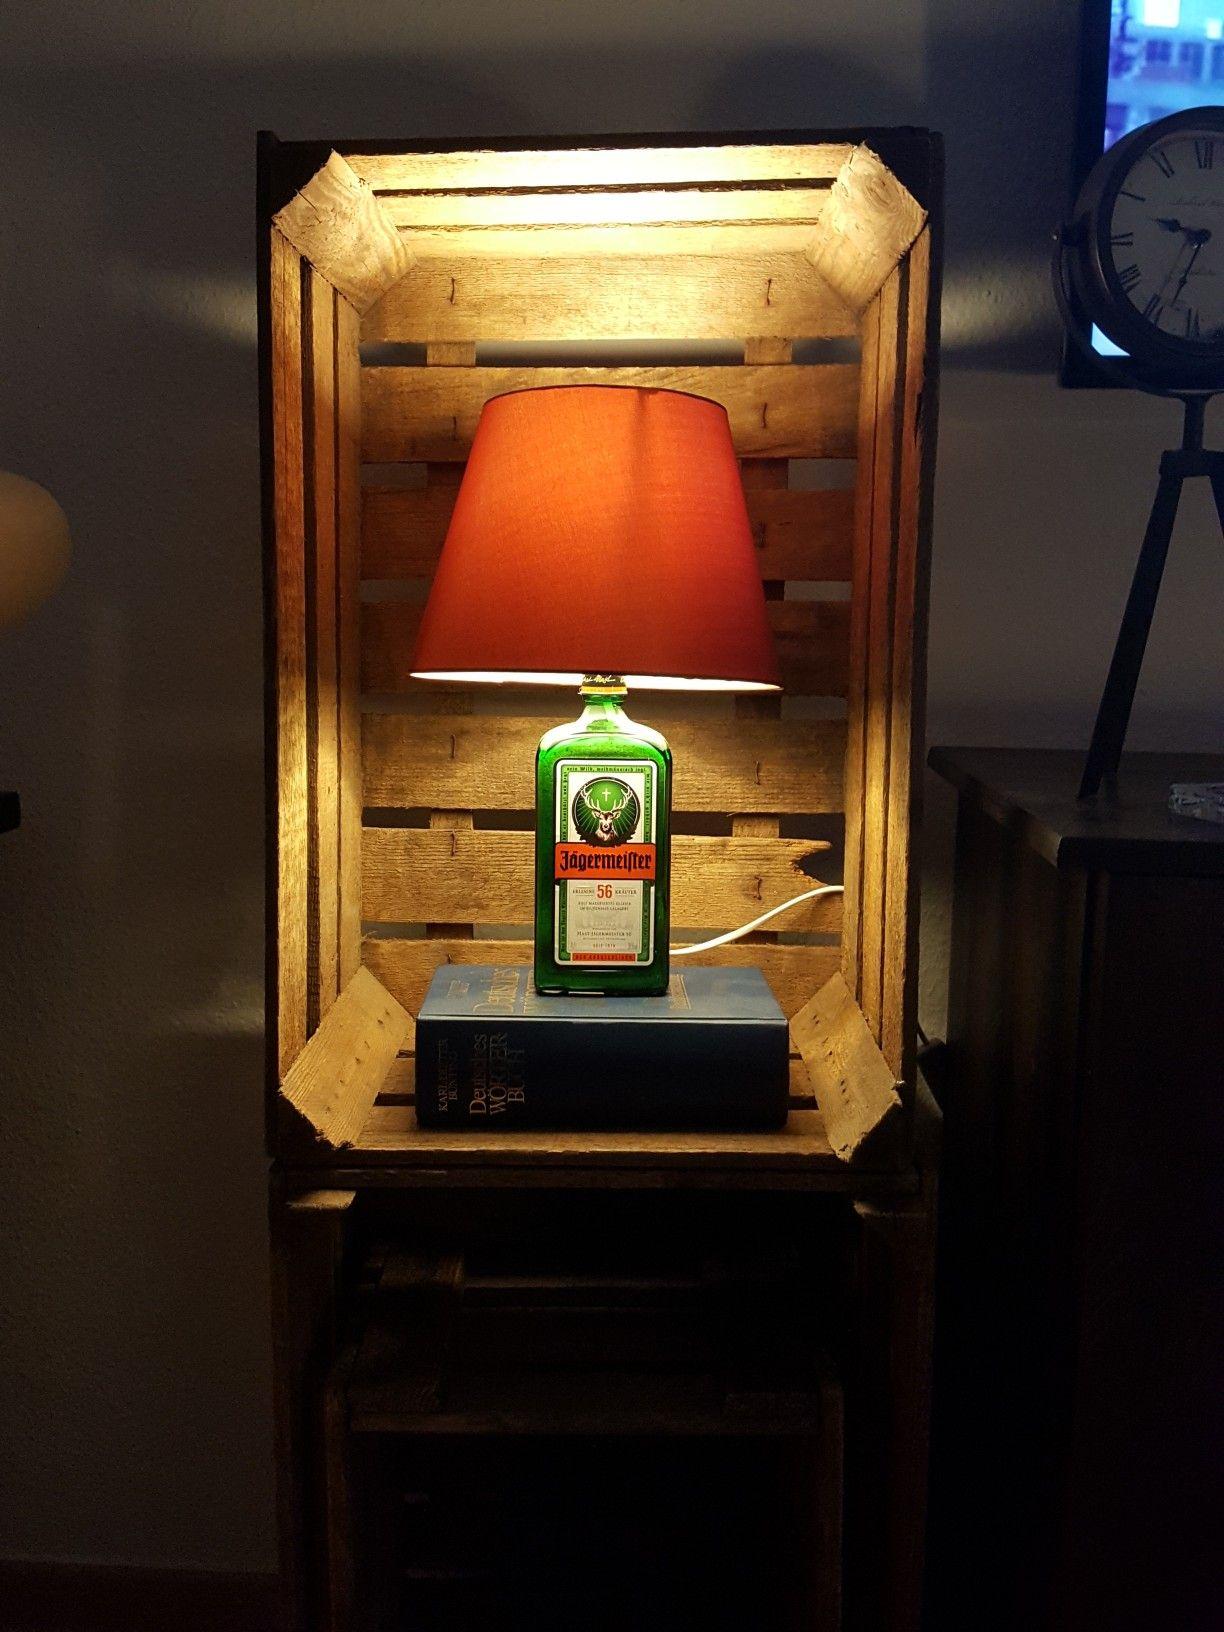 Jägermeister Lampe steht zum Verkauf | constructions | Pinterest ...